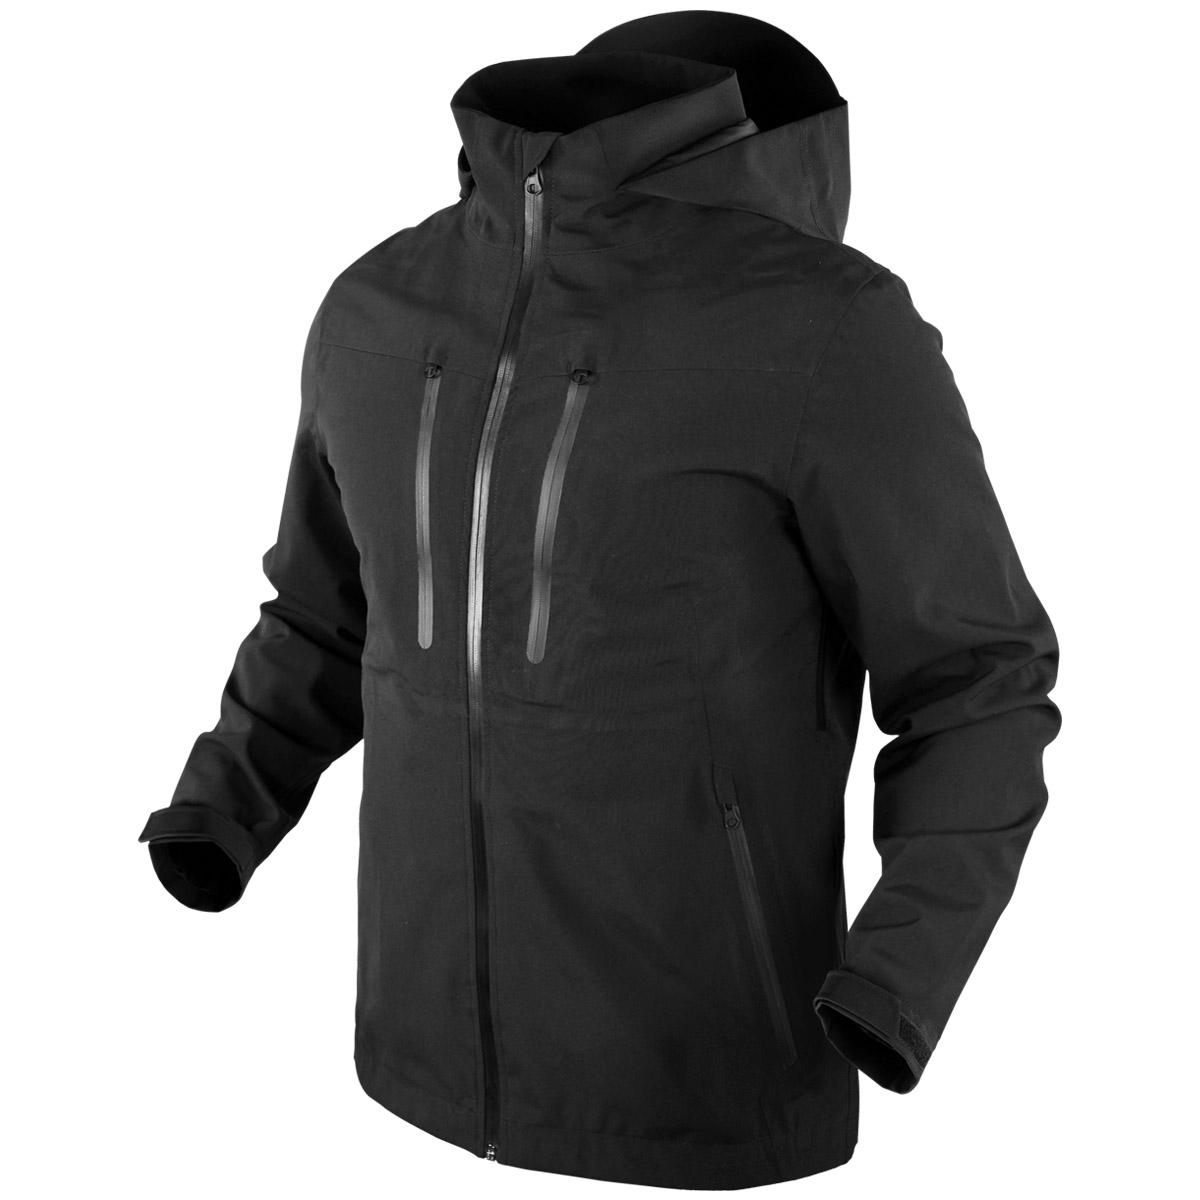 Condor Aegis Hardshell Hooded Tactical Jacket Mens Waterproof Hiking